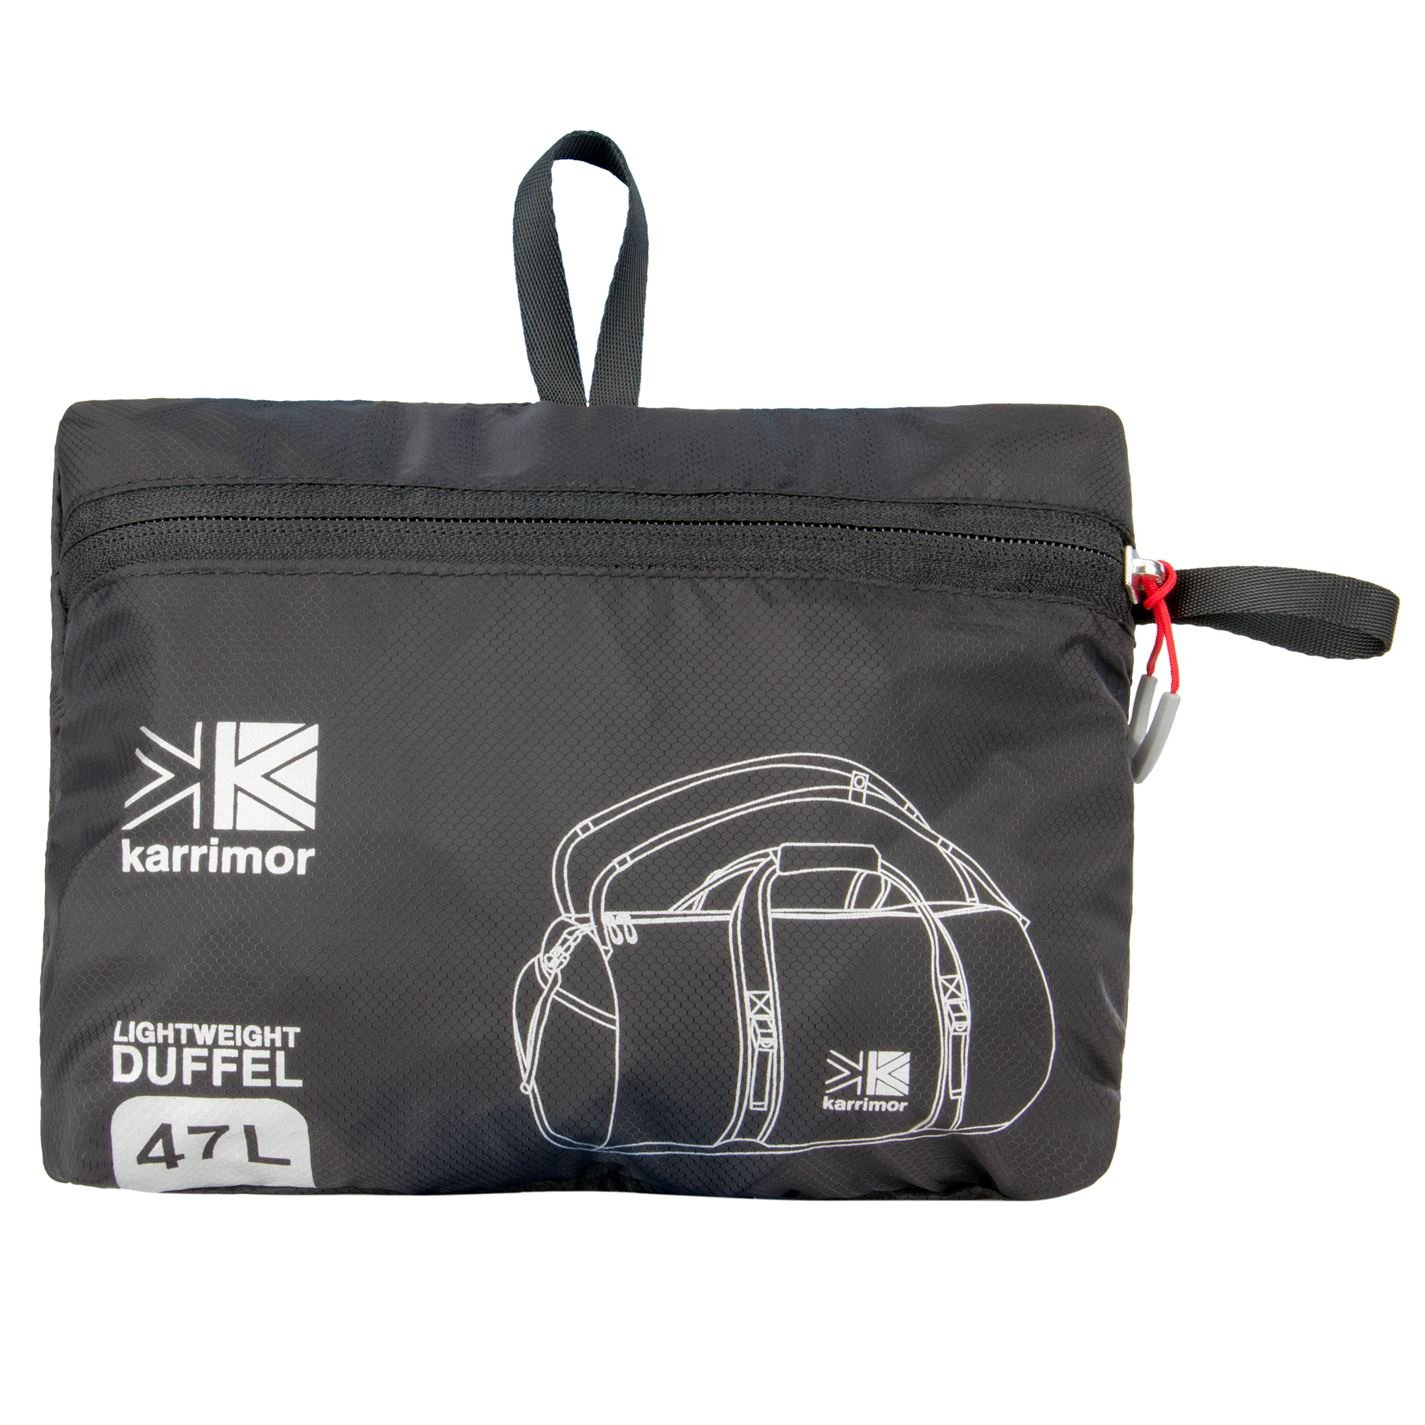 1031d730f7e6 Karrimor Unisex Helium 47L Duffle Bag  Amazon.co.uk  Sports   Outdoors